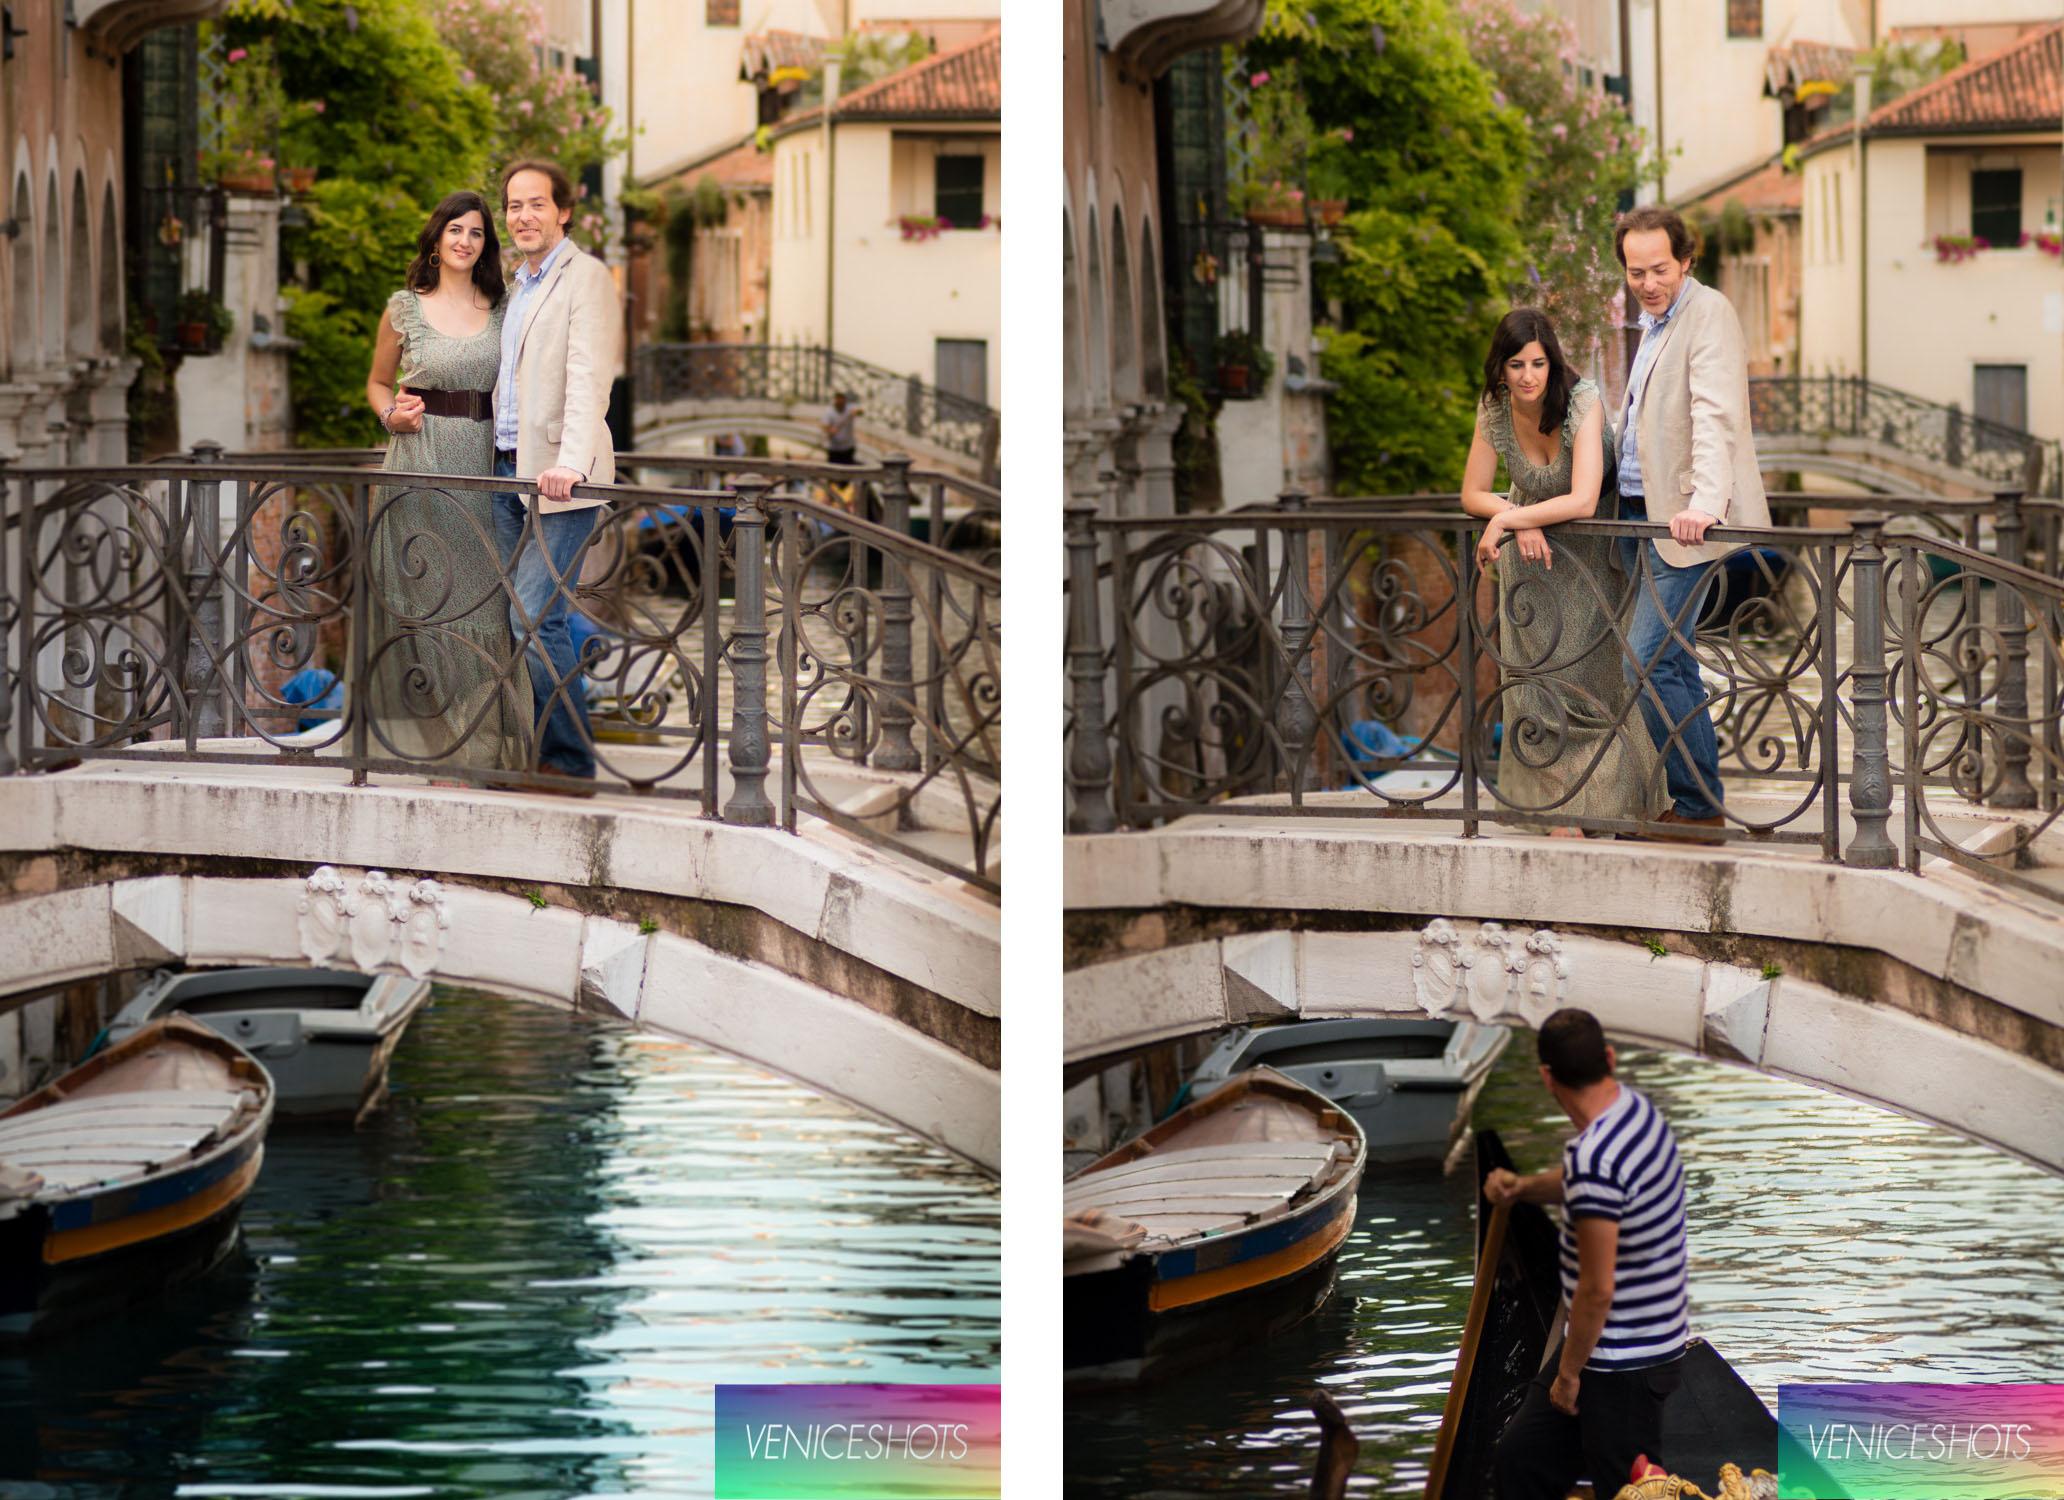 fotografia professionale Venezia_copyright claudia Rossini veniceshots.com_DSC_3463b.jpg